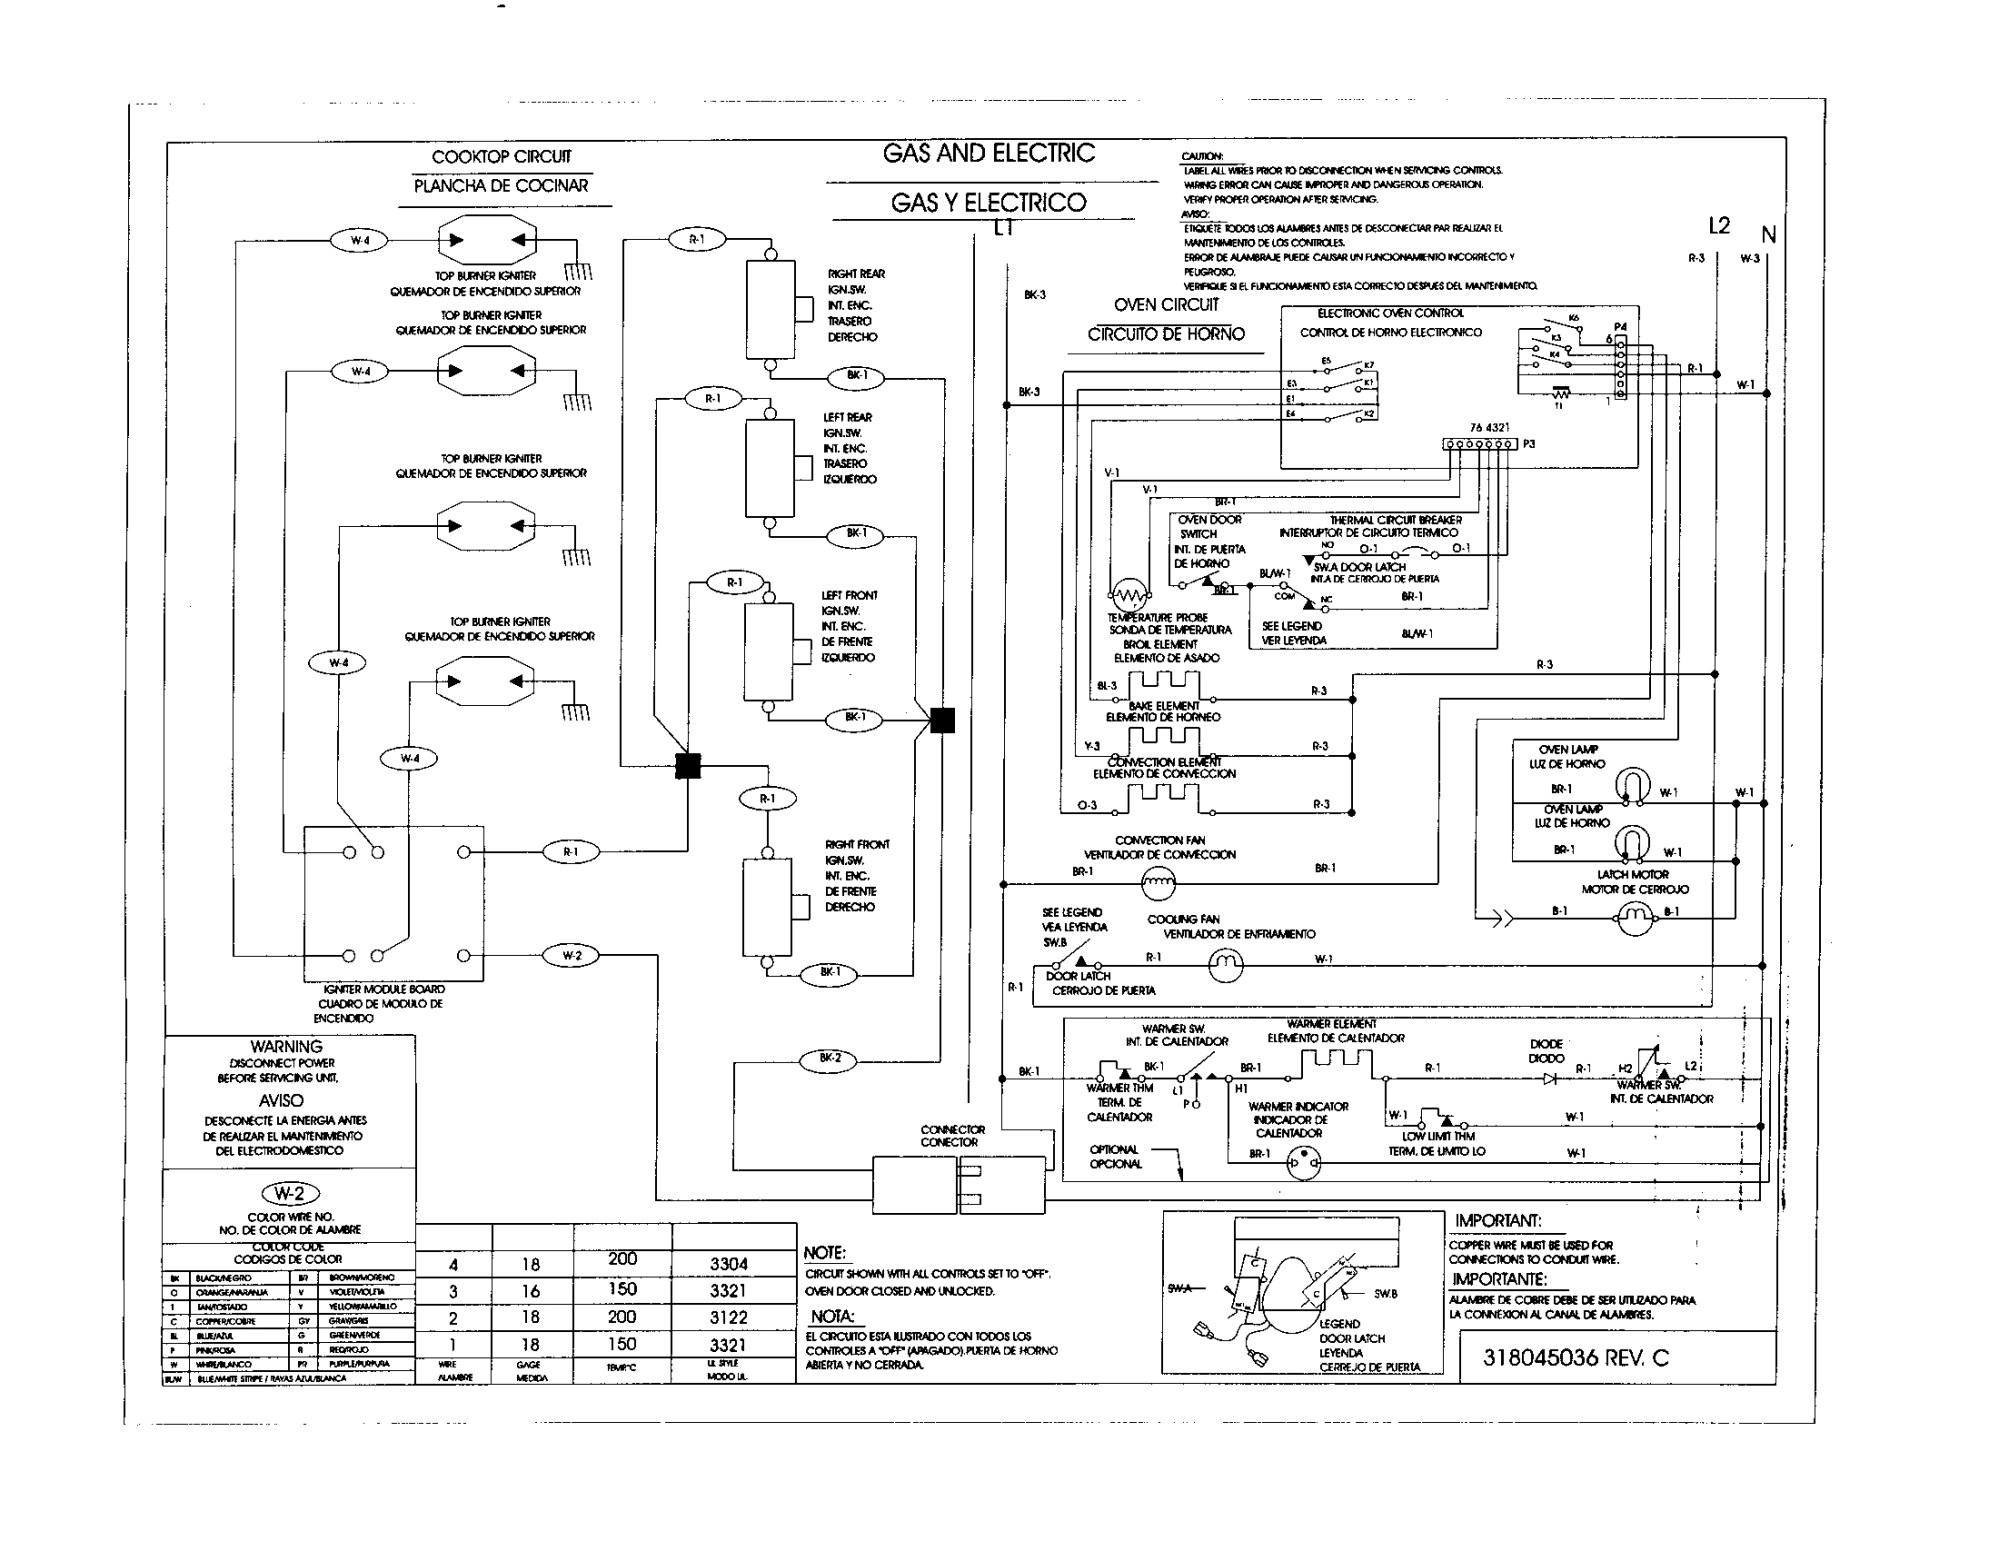 hight resolution of kenmore refrigerator wiring schematic free wiring diagram kenmore refrigerator ice maker parts diagram kenmore refrigerator parts diagram